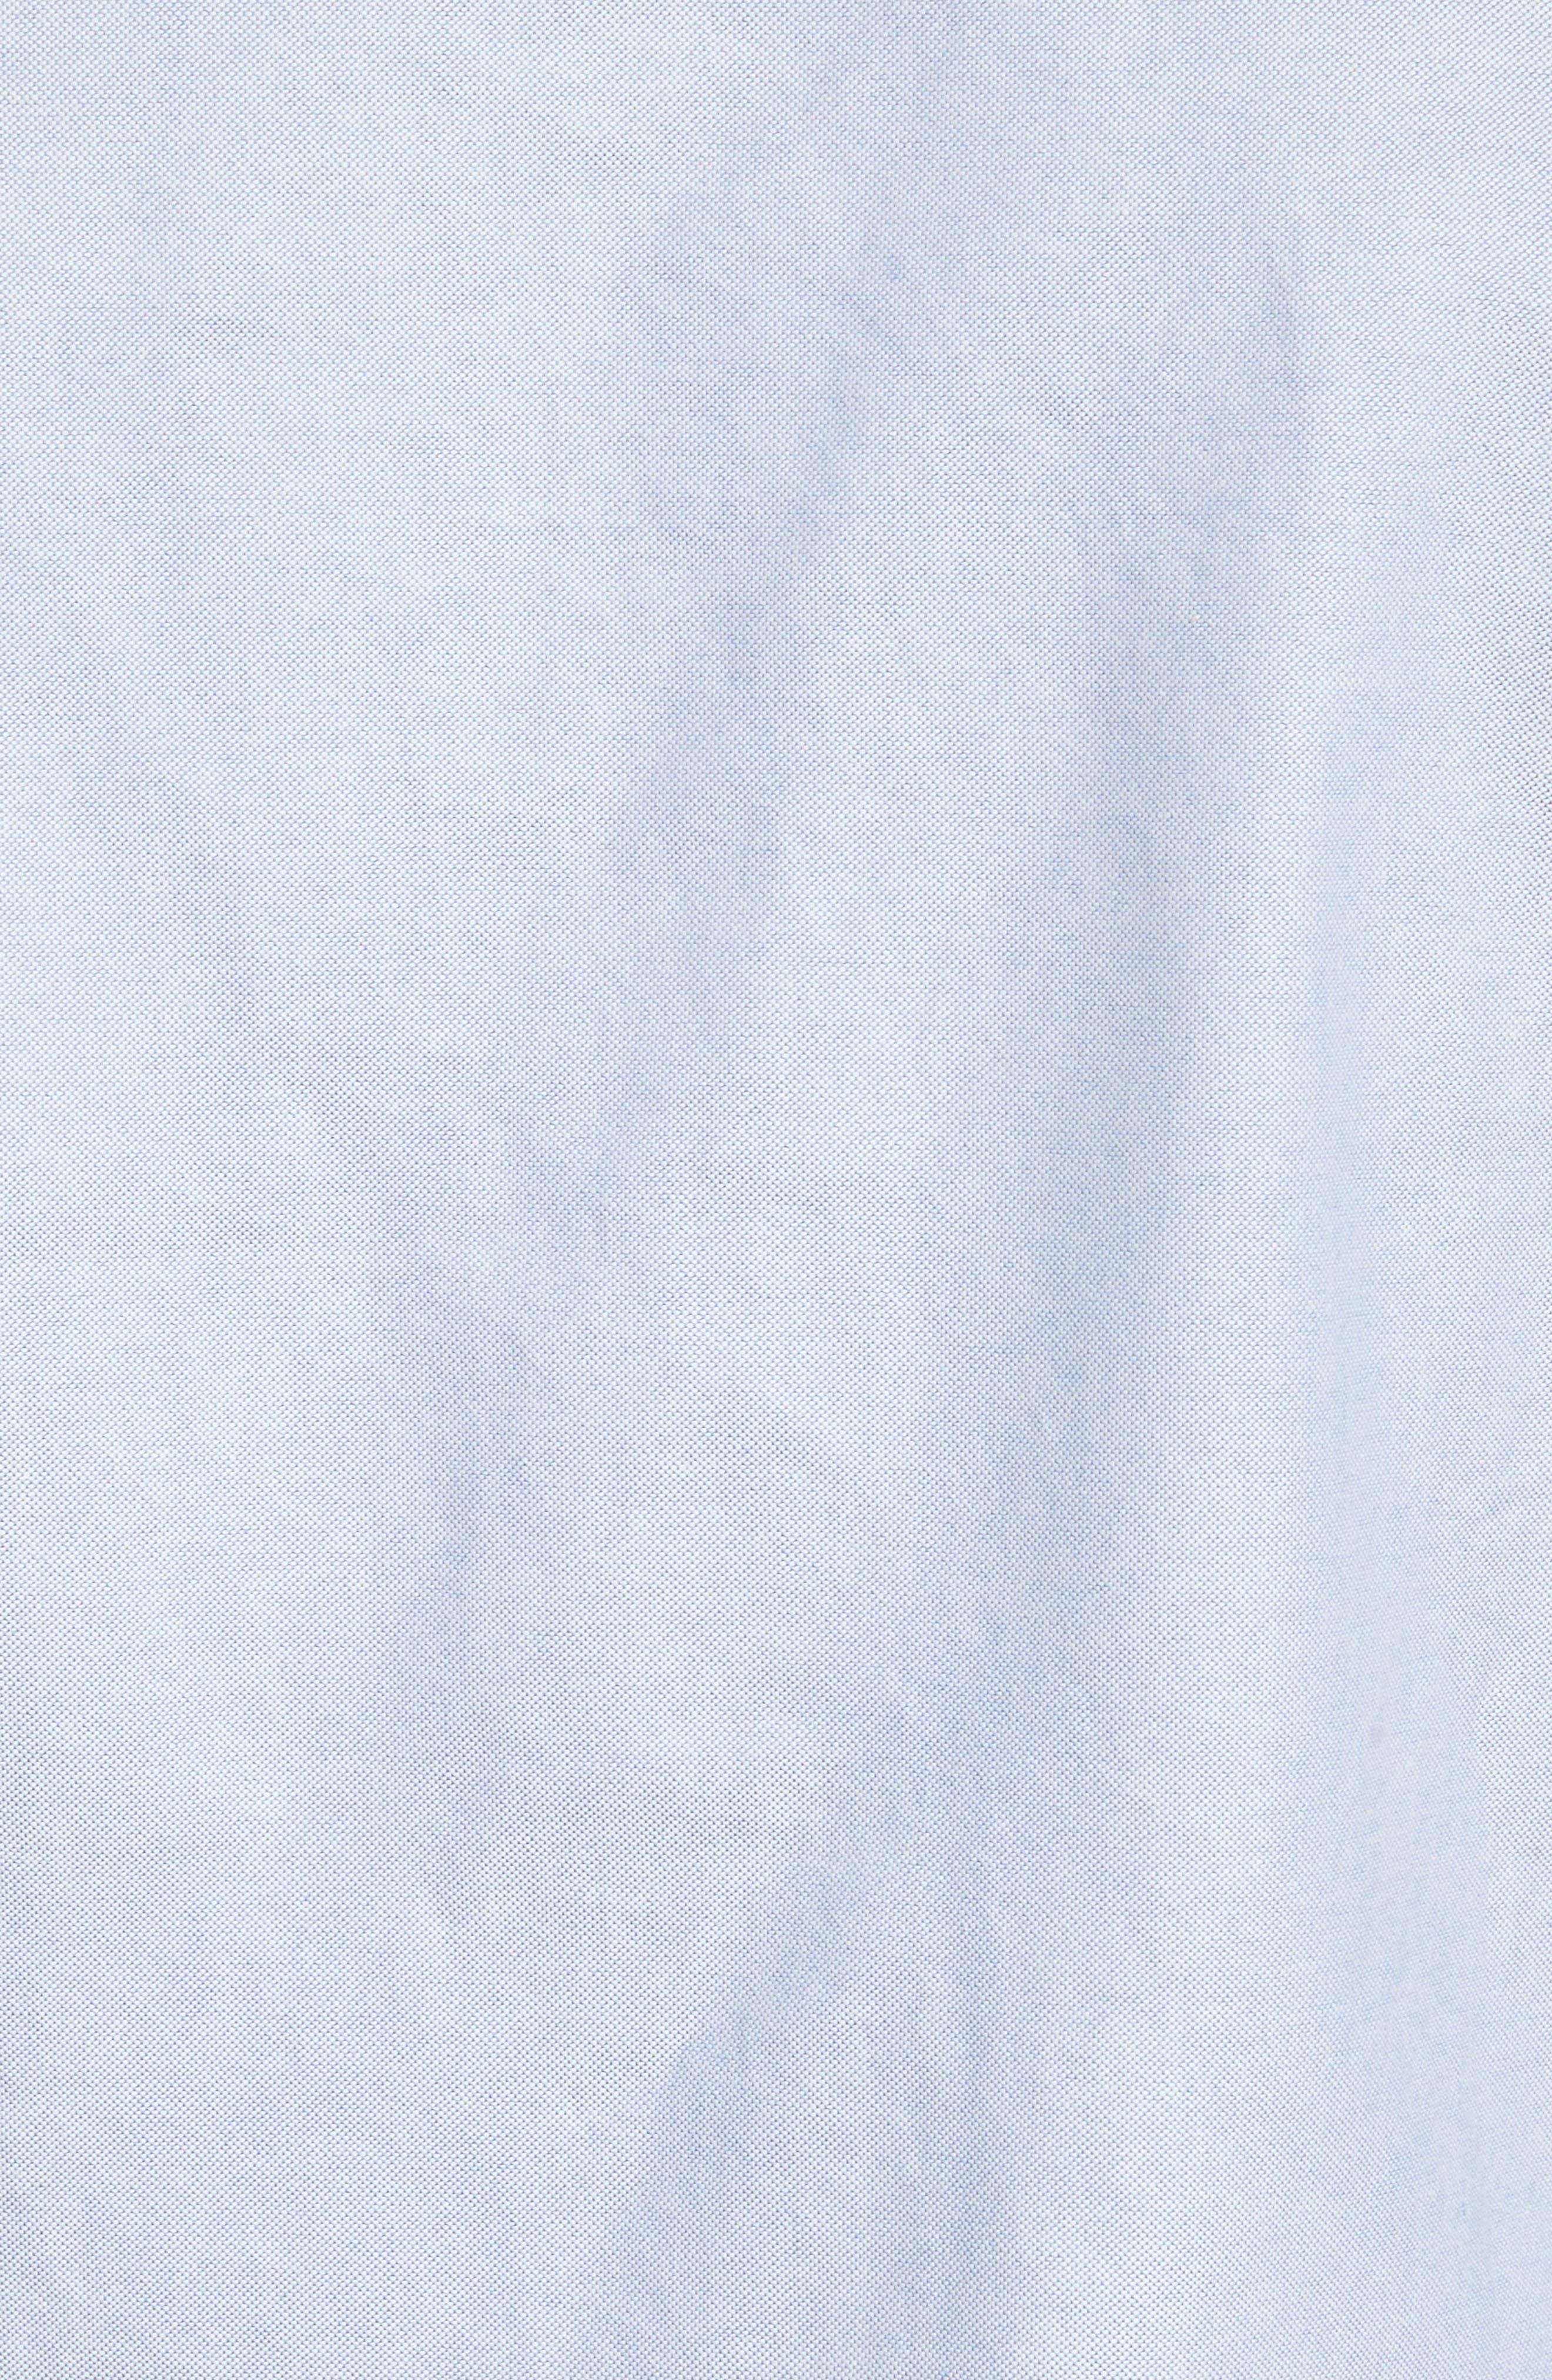 Extra Trim Fit Oxford Shirt with Grosgrain Trim,                             Alternate thumbnail 2, color,                             LIGHT BLUE